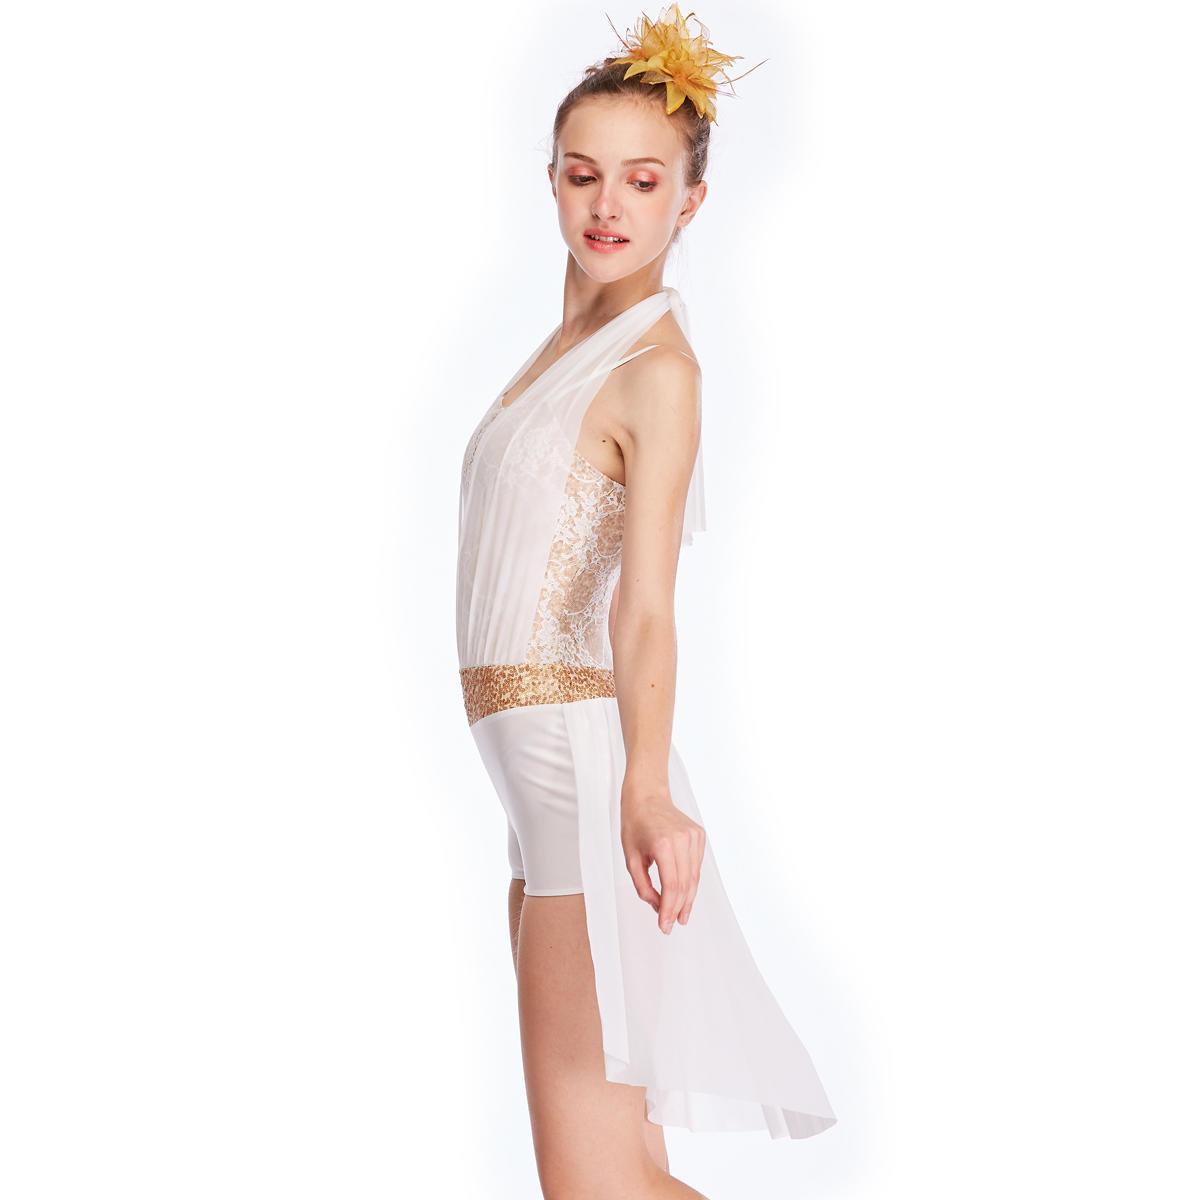 MiDee Half Skirt Halter Neck Lyrical Dance Dress Costume Jazz Latin Ice Skating Ballet Dance Costume